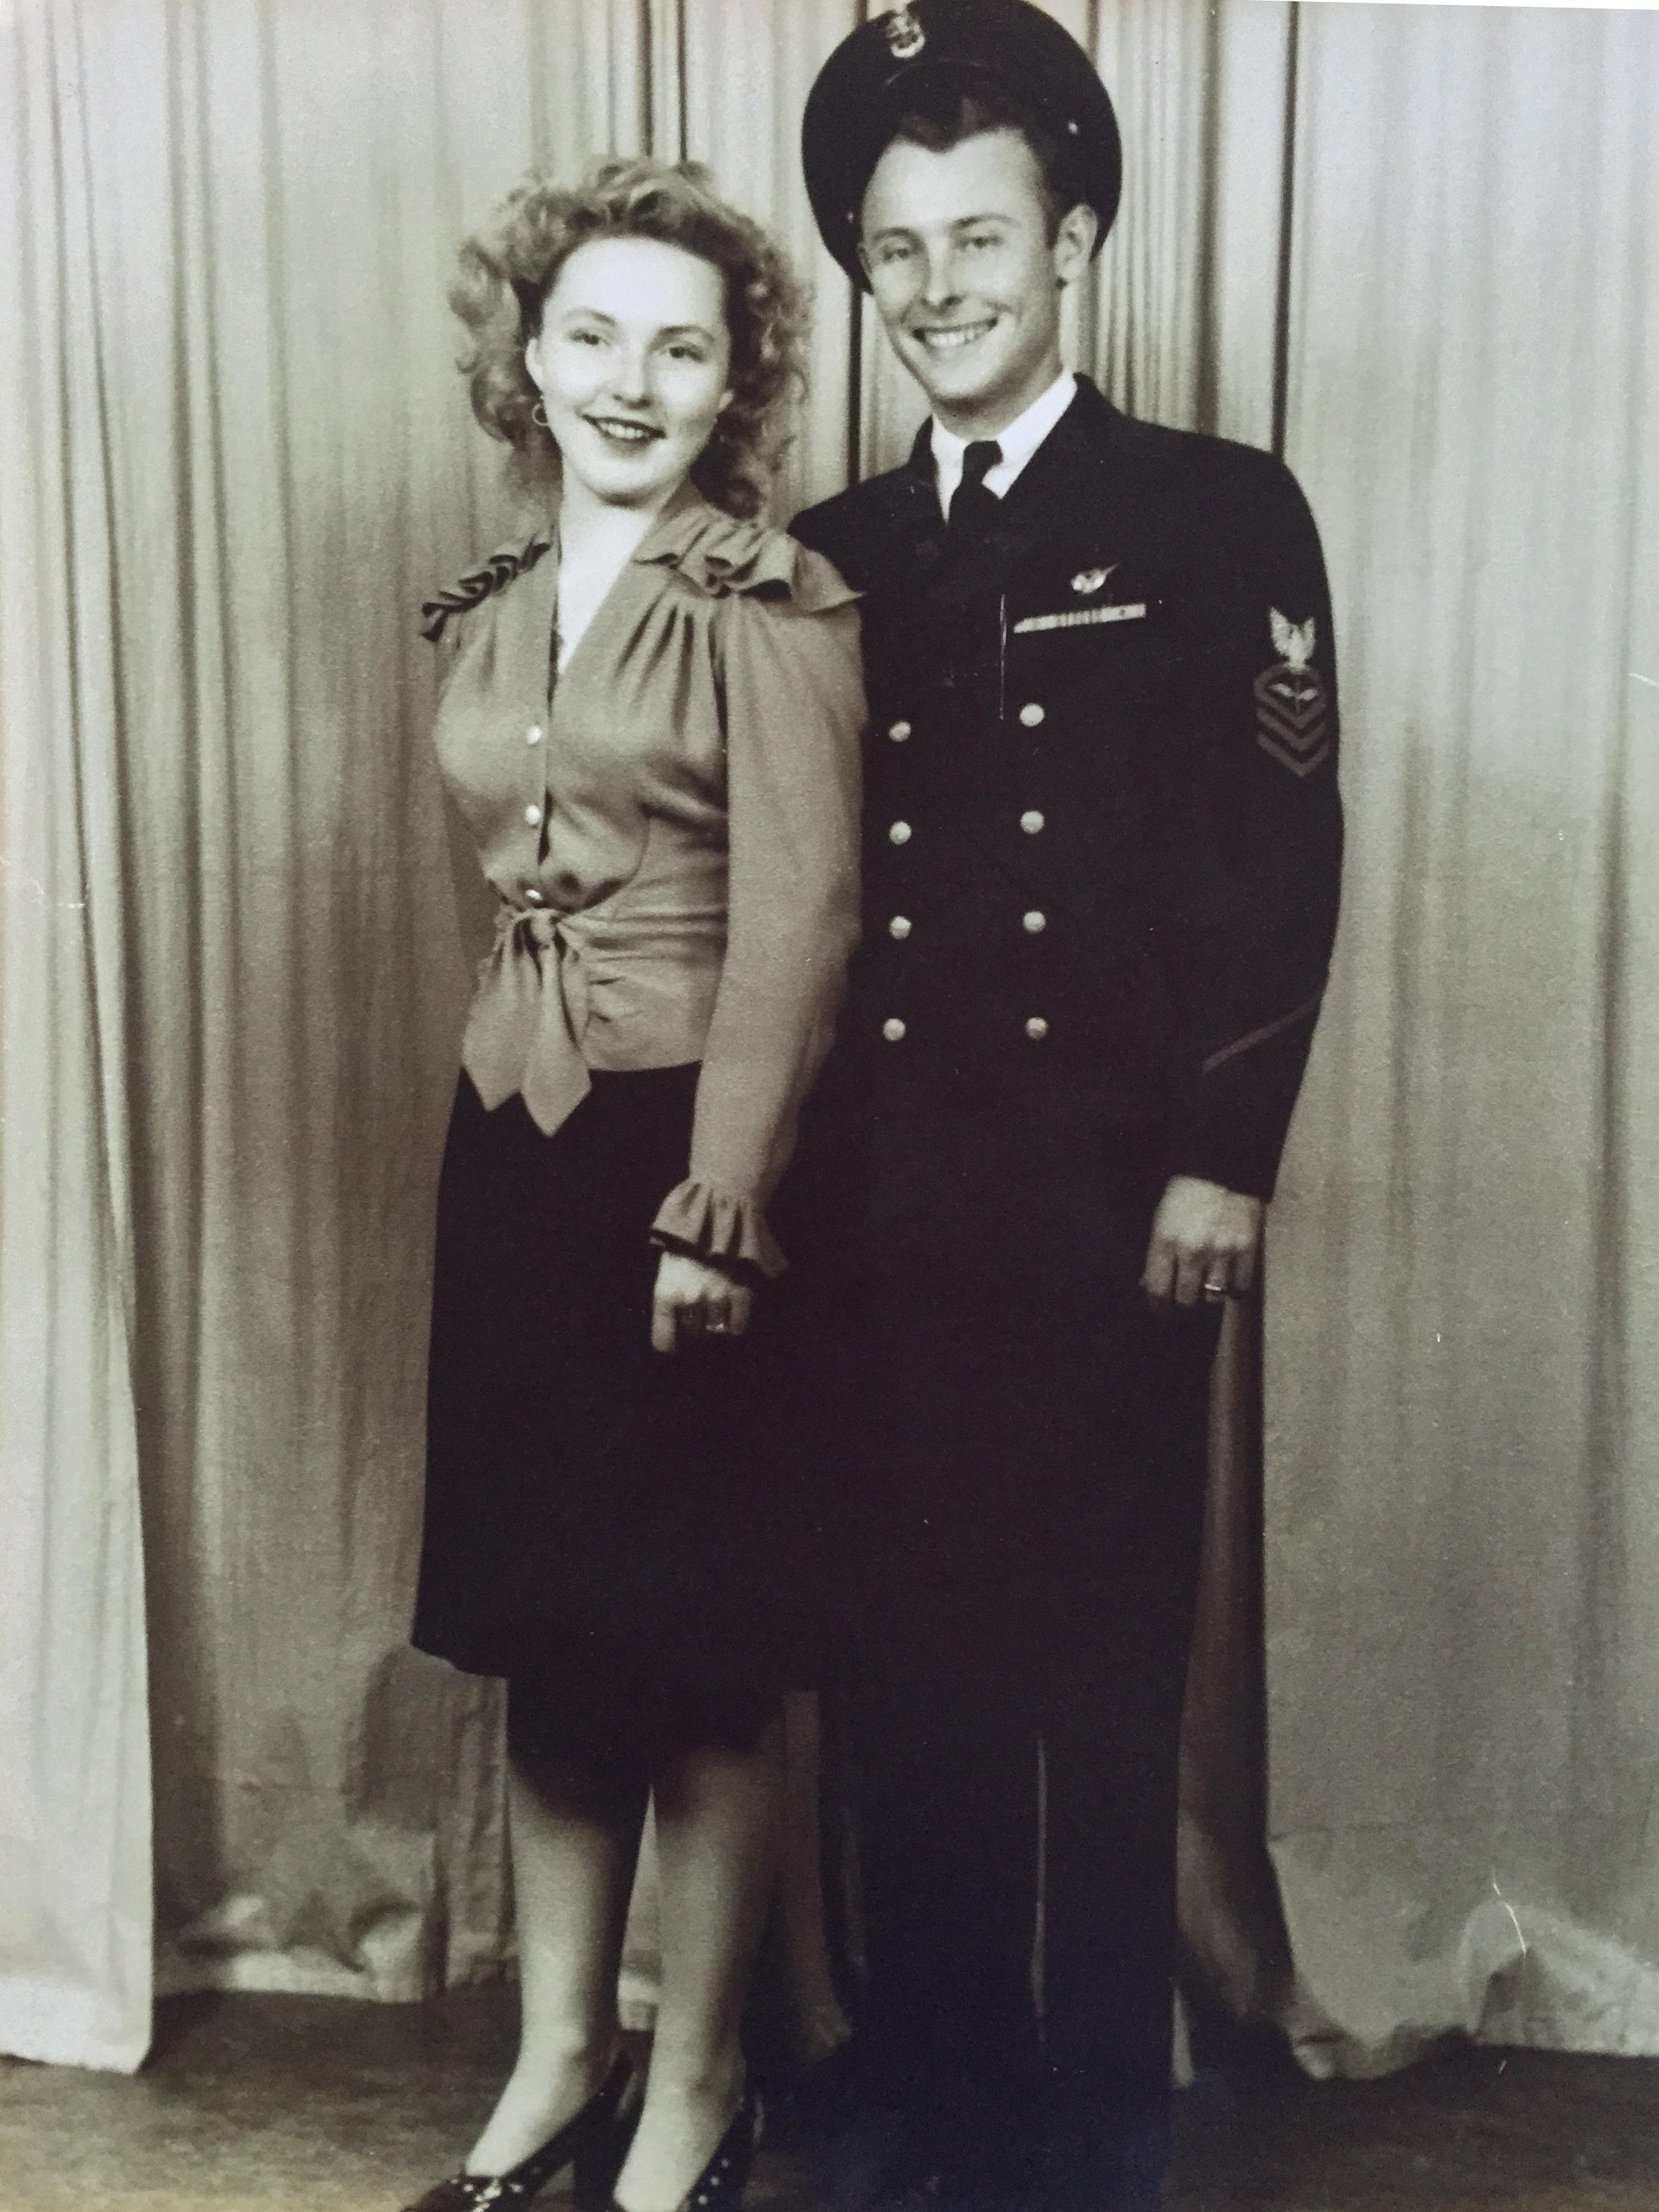 My grandparents' wedding day